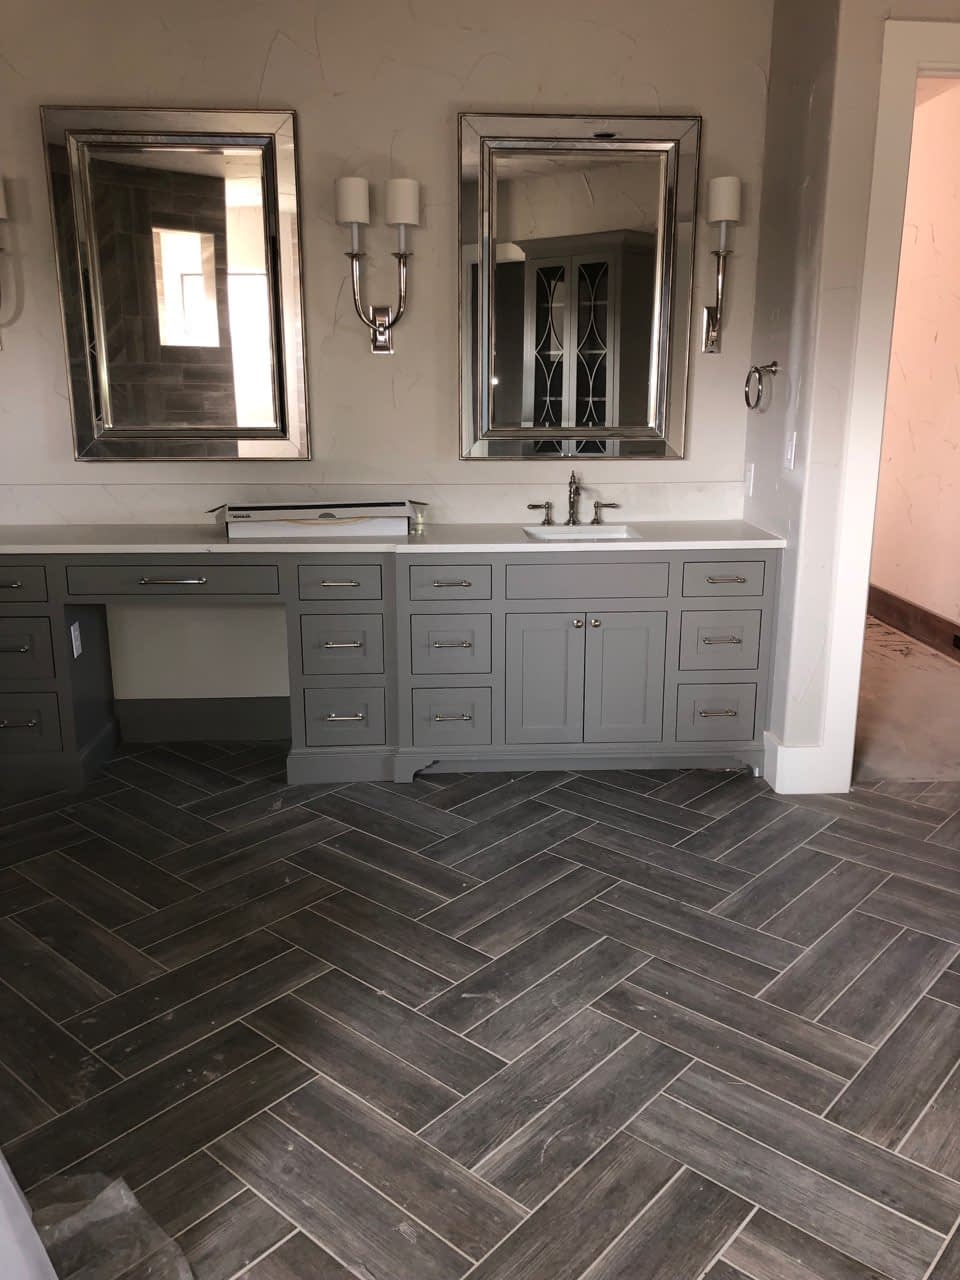 multi-toned floor